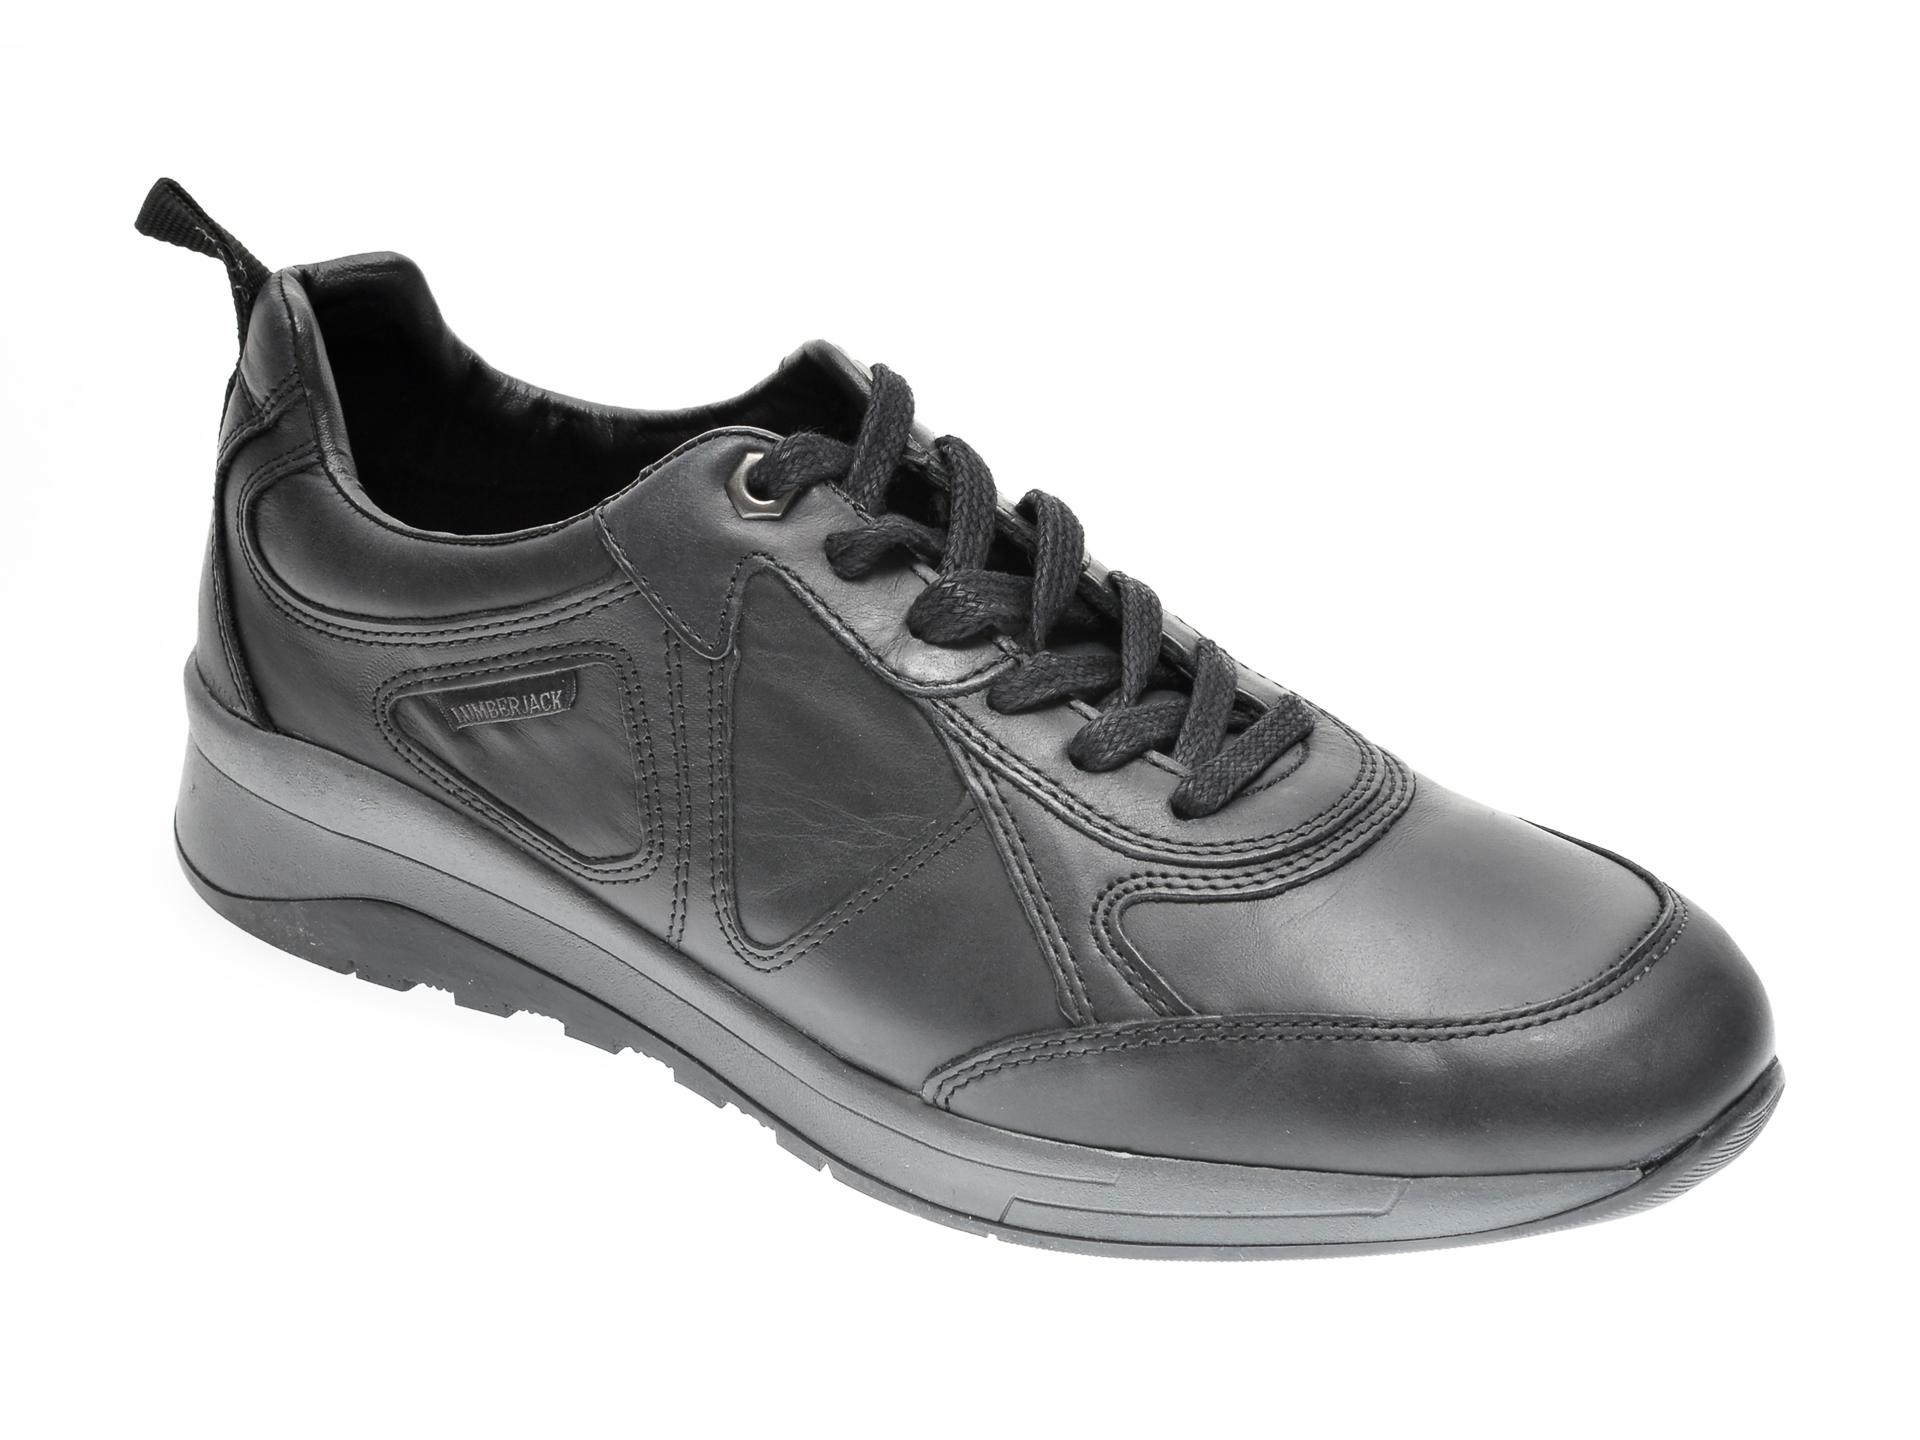 Pantofi sport LUMBERJACK negri, 712001, din piele naturala imagine otter.ro